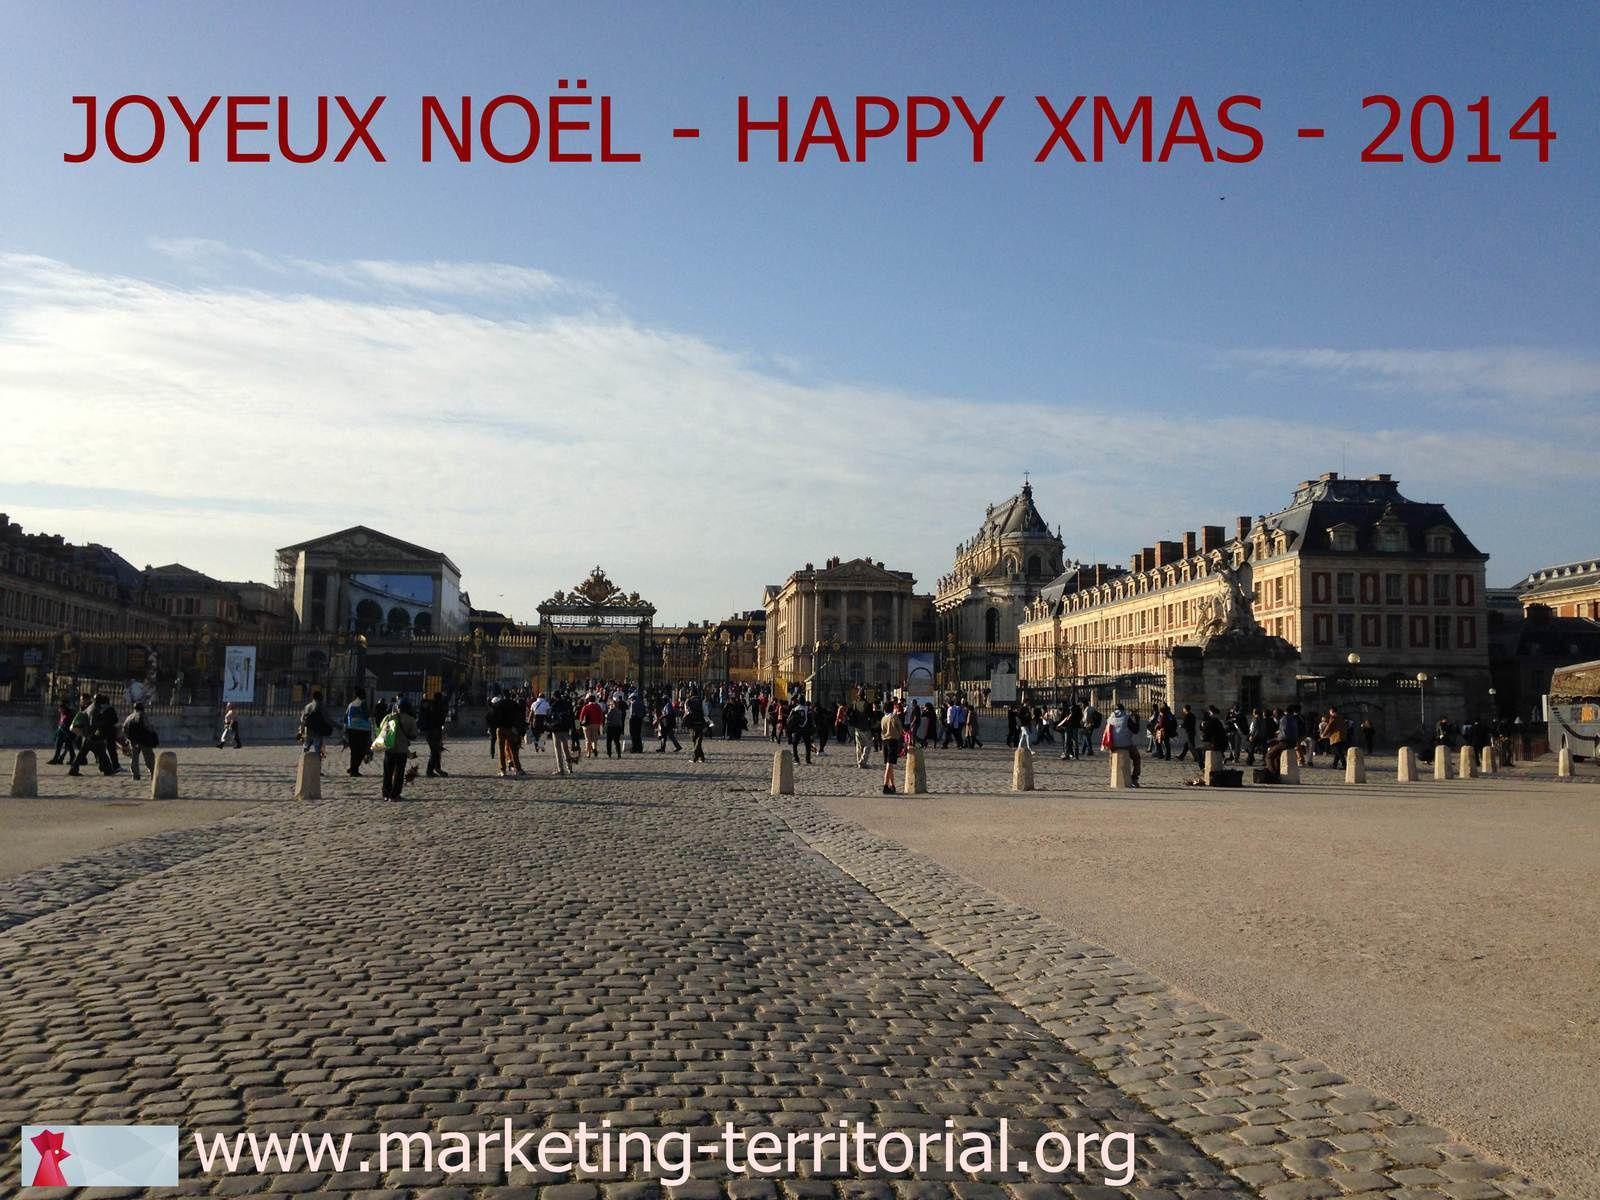 Joyeuses fêtes de Noël - Merry Christmas !